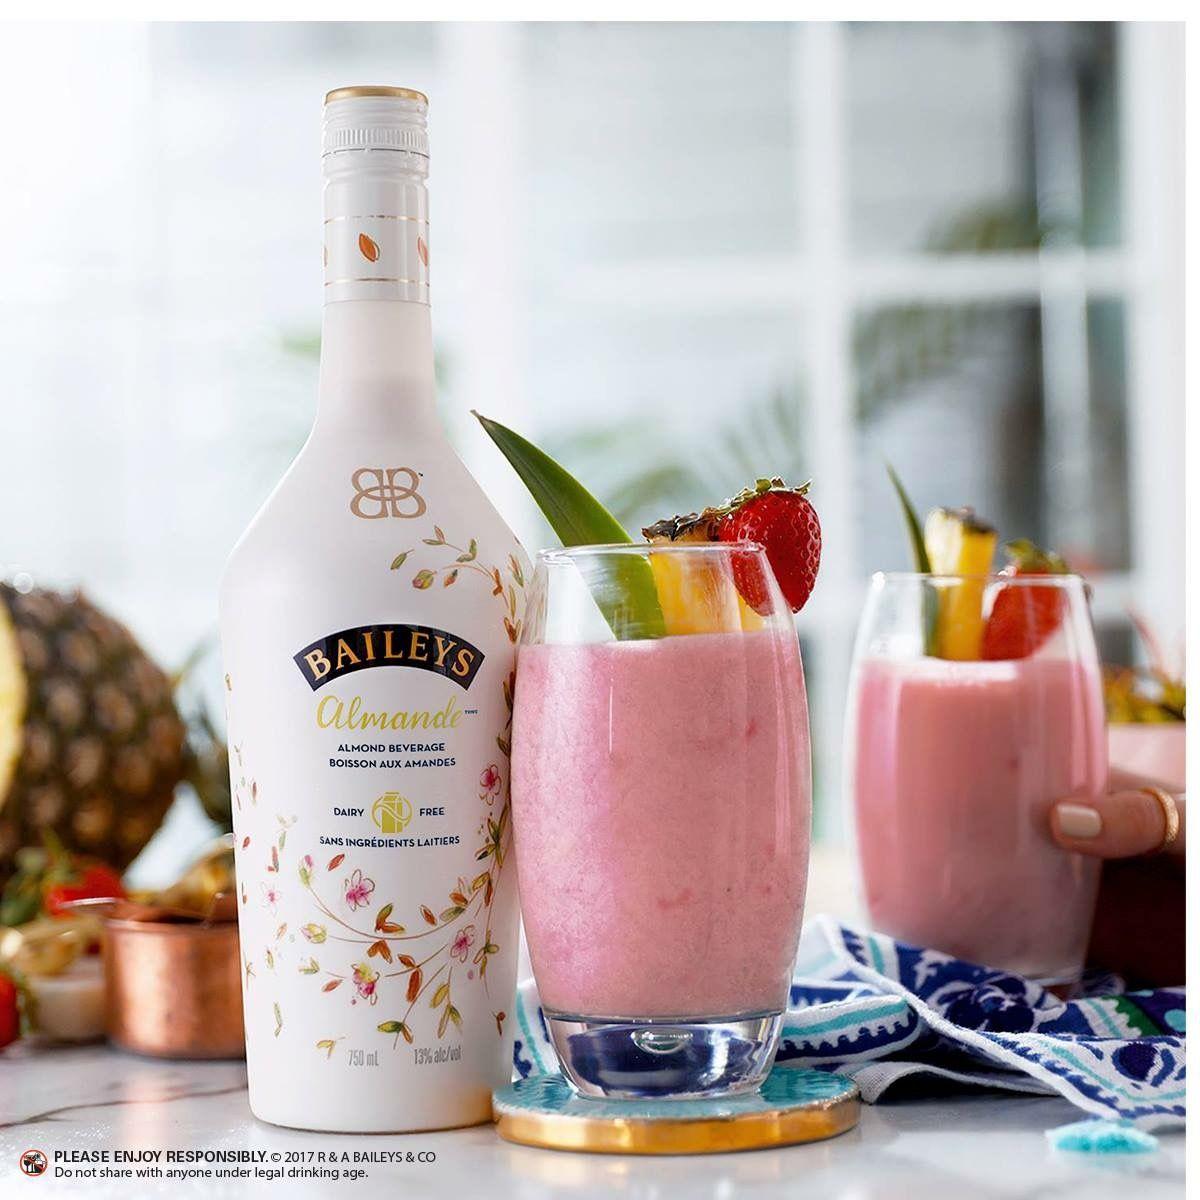 Baileys Almande Smoothie RECIPE: ½ Cup Pineapple; ½ Cup